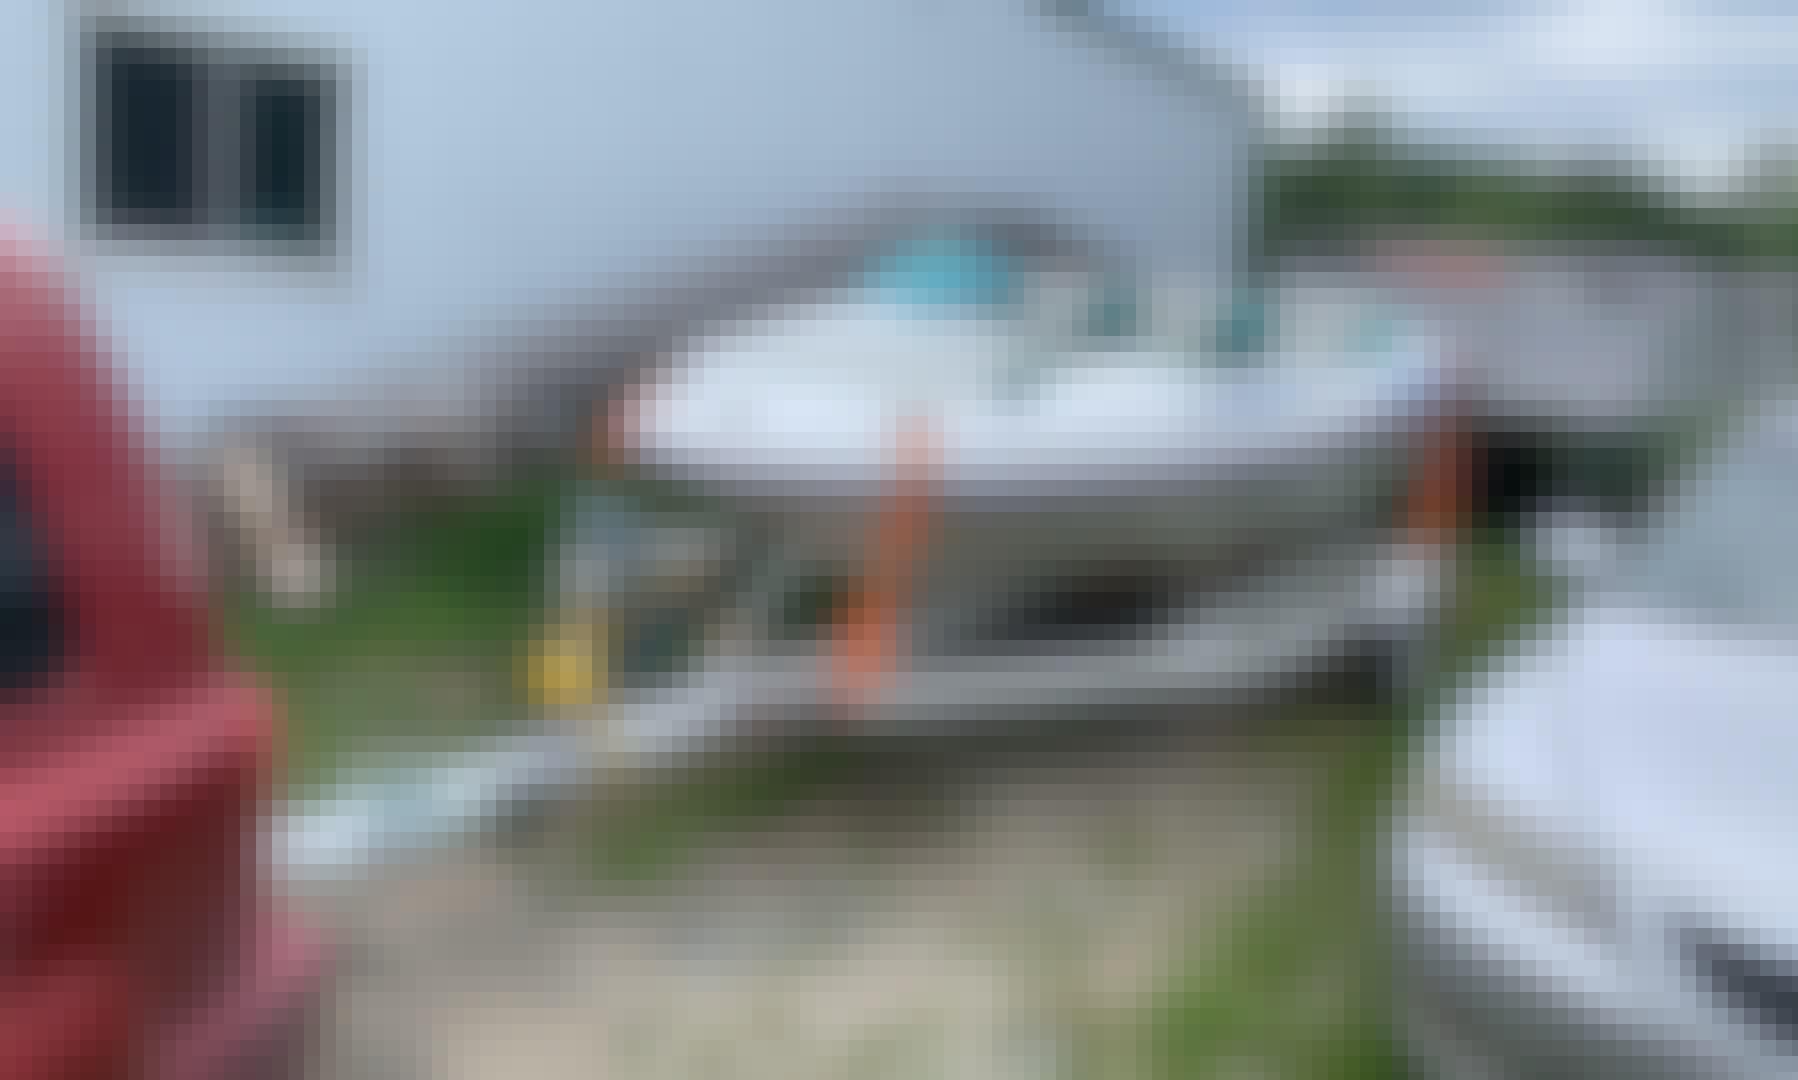 Seadoo sportster LE Boat Rental in Lambton, Québec